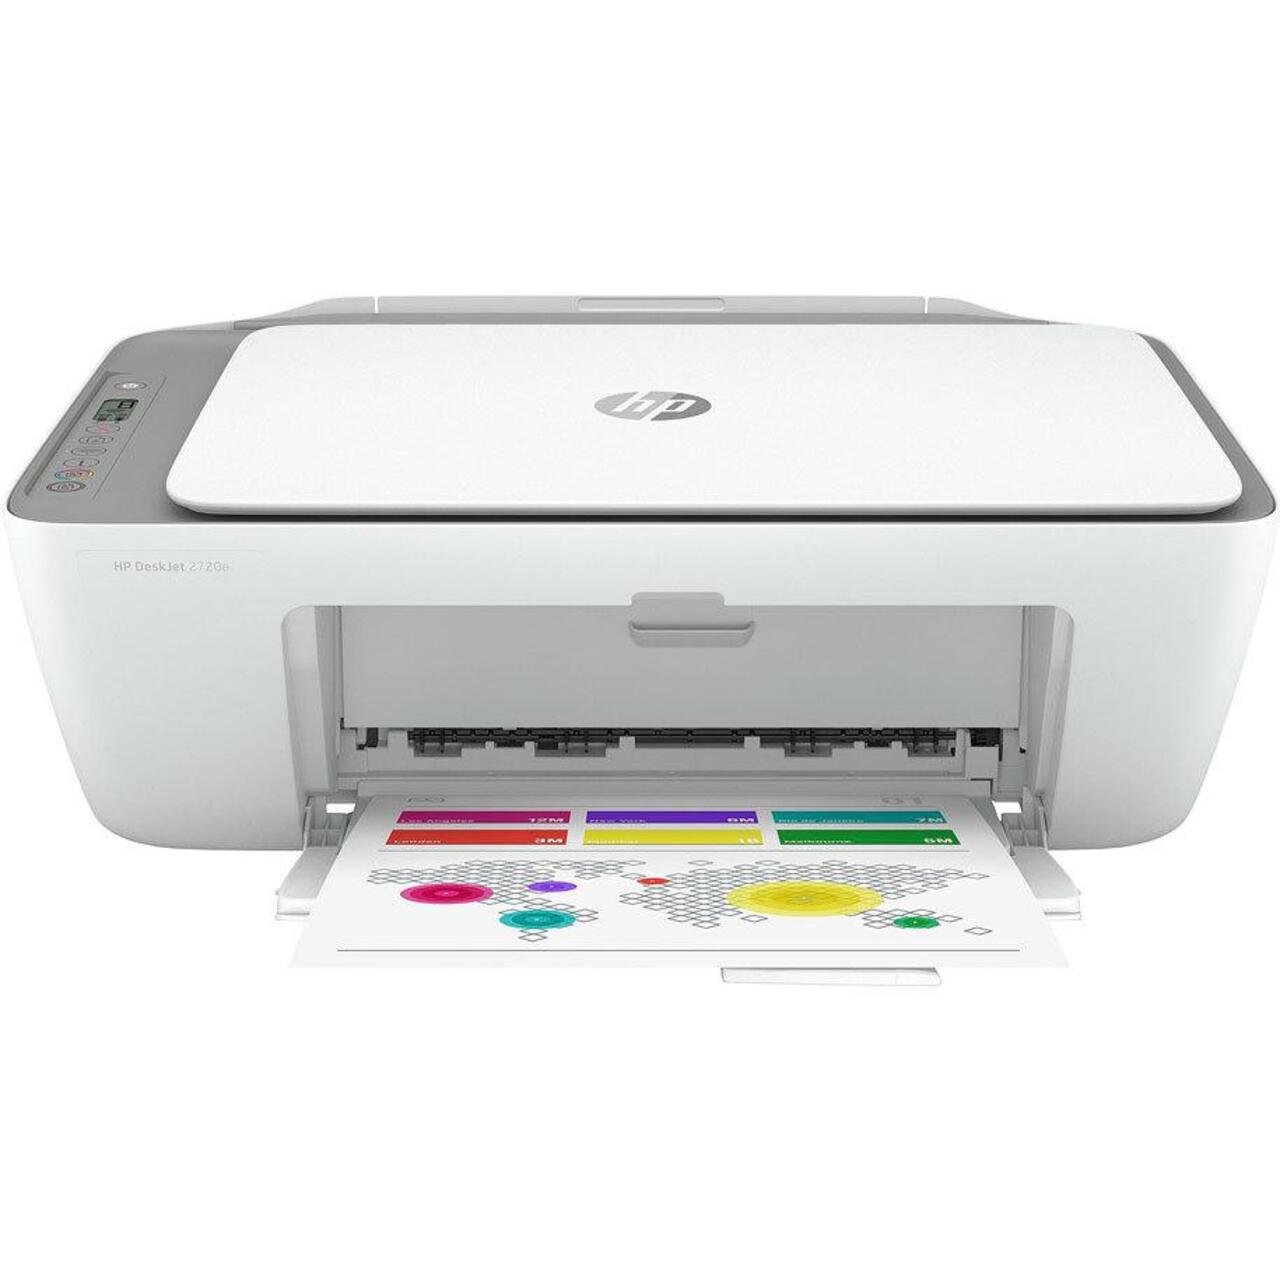 Мастиленоструен принтер HP DESKJET 2720E 26K67B , Мастиленоструен